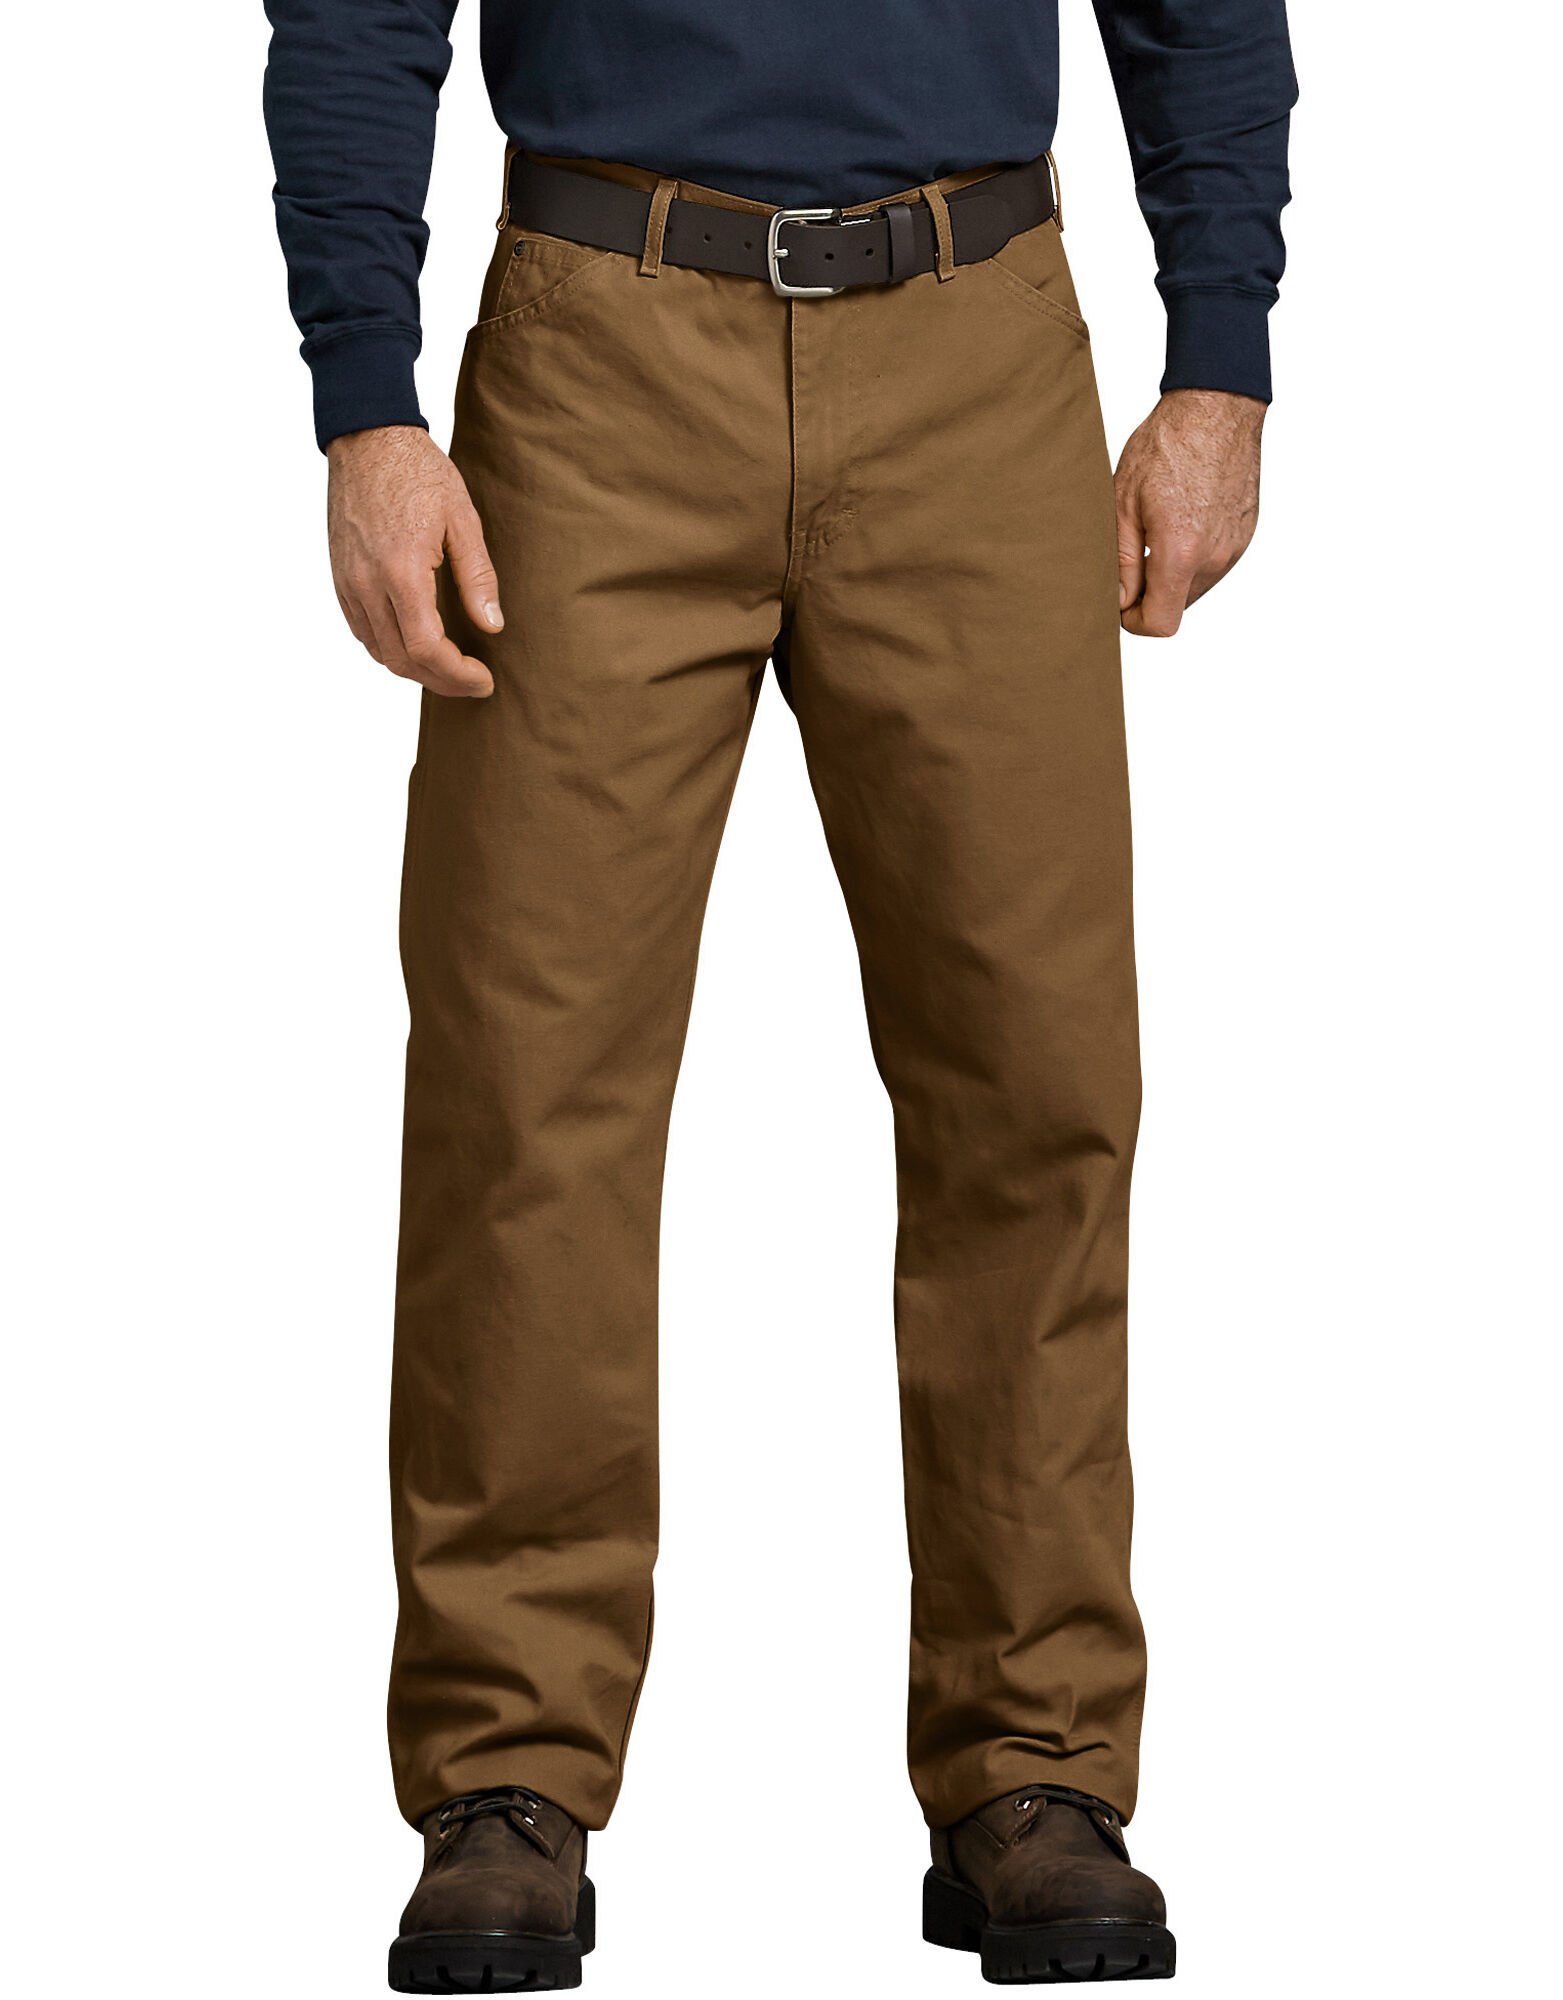 Mens Carpenter Jeans pq9W9Mnw